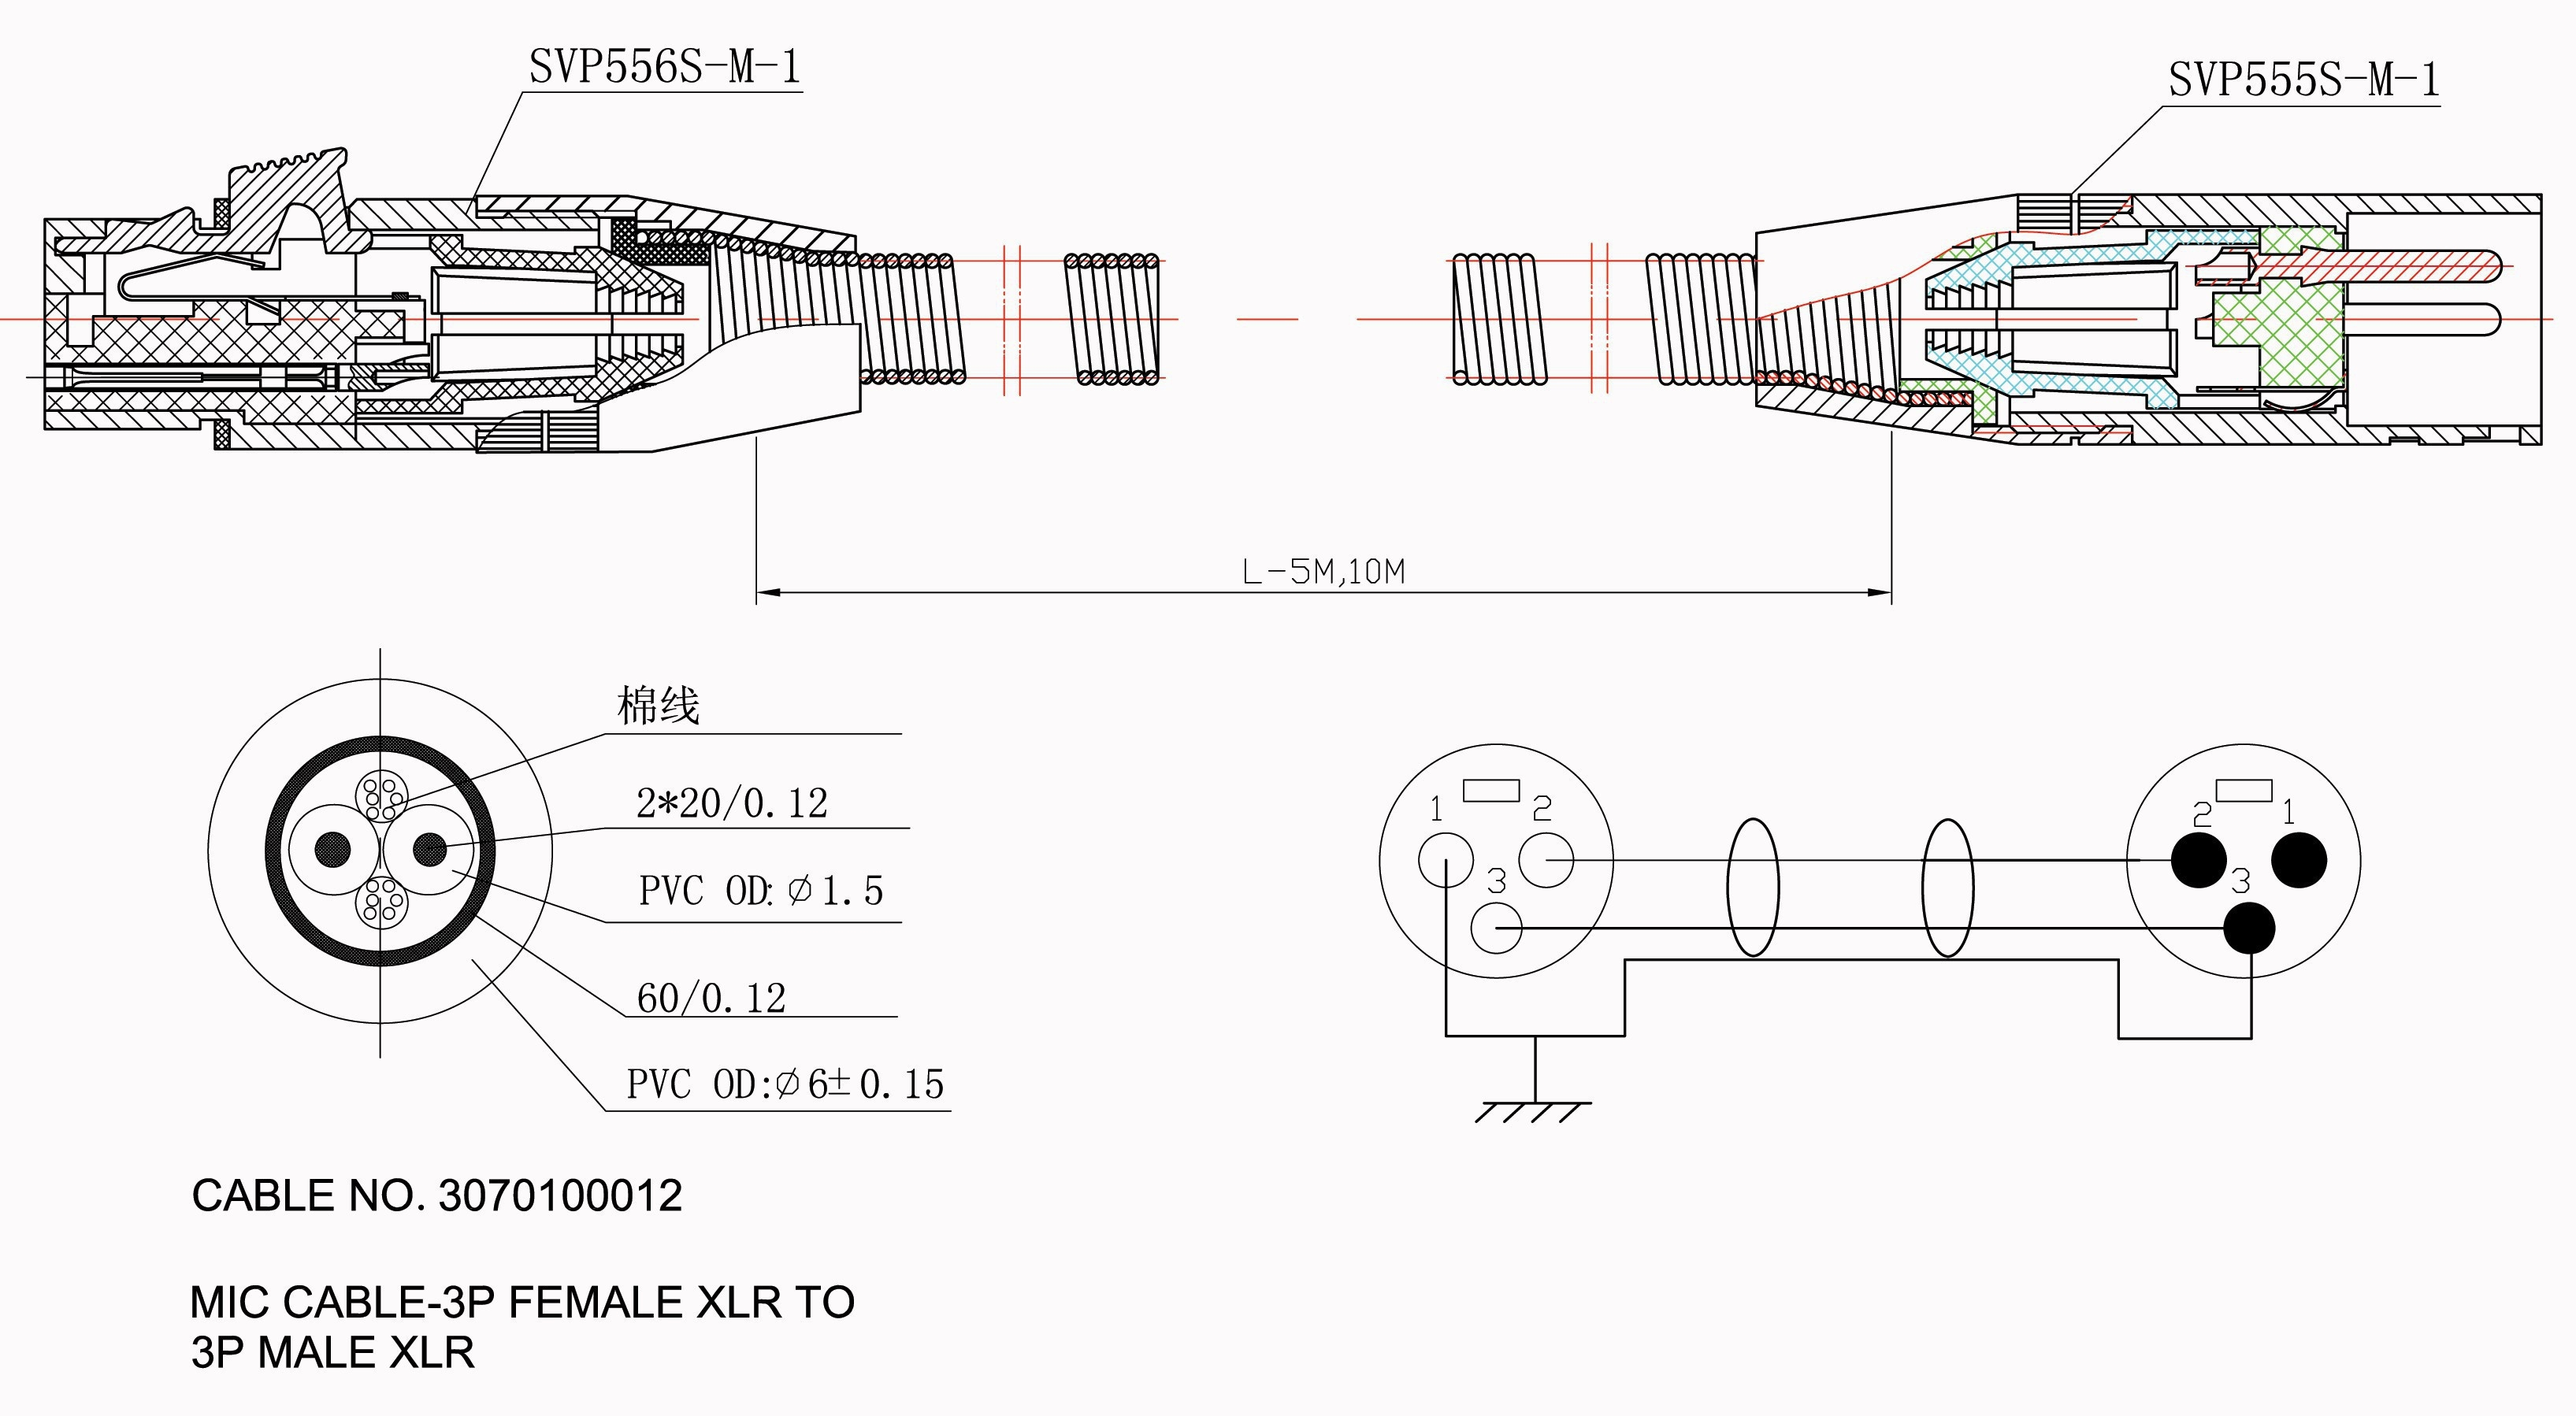 3 Phase Motor Wiring Diagram 12 Leads - 3 Phase Motor Wiring Diagram 9 Leads New